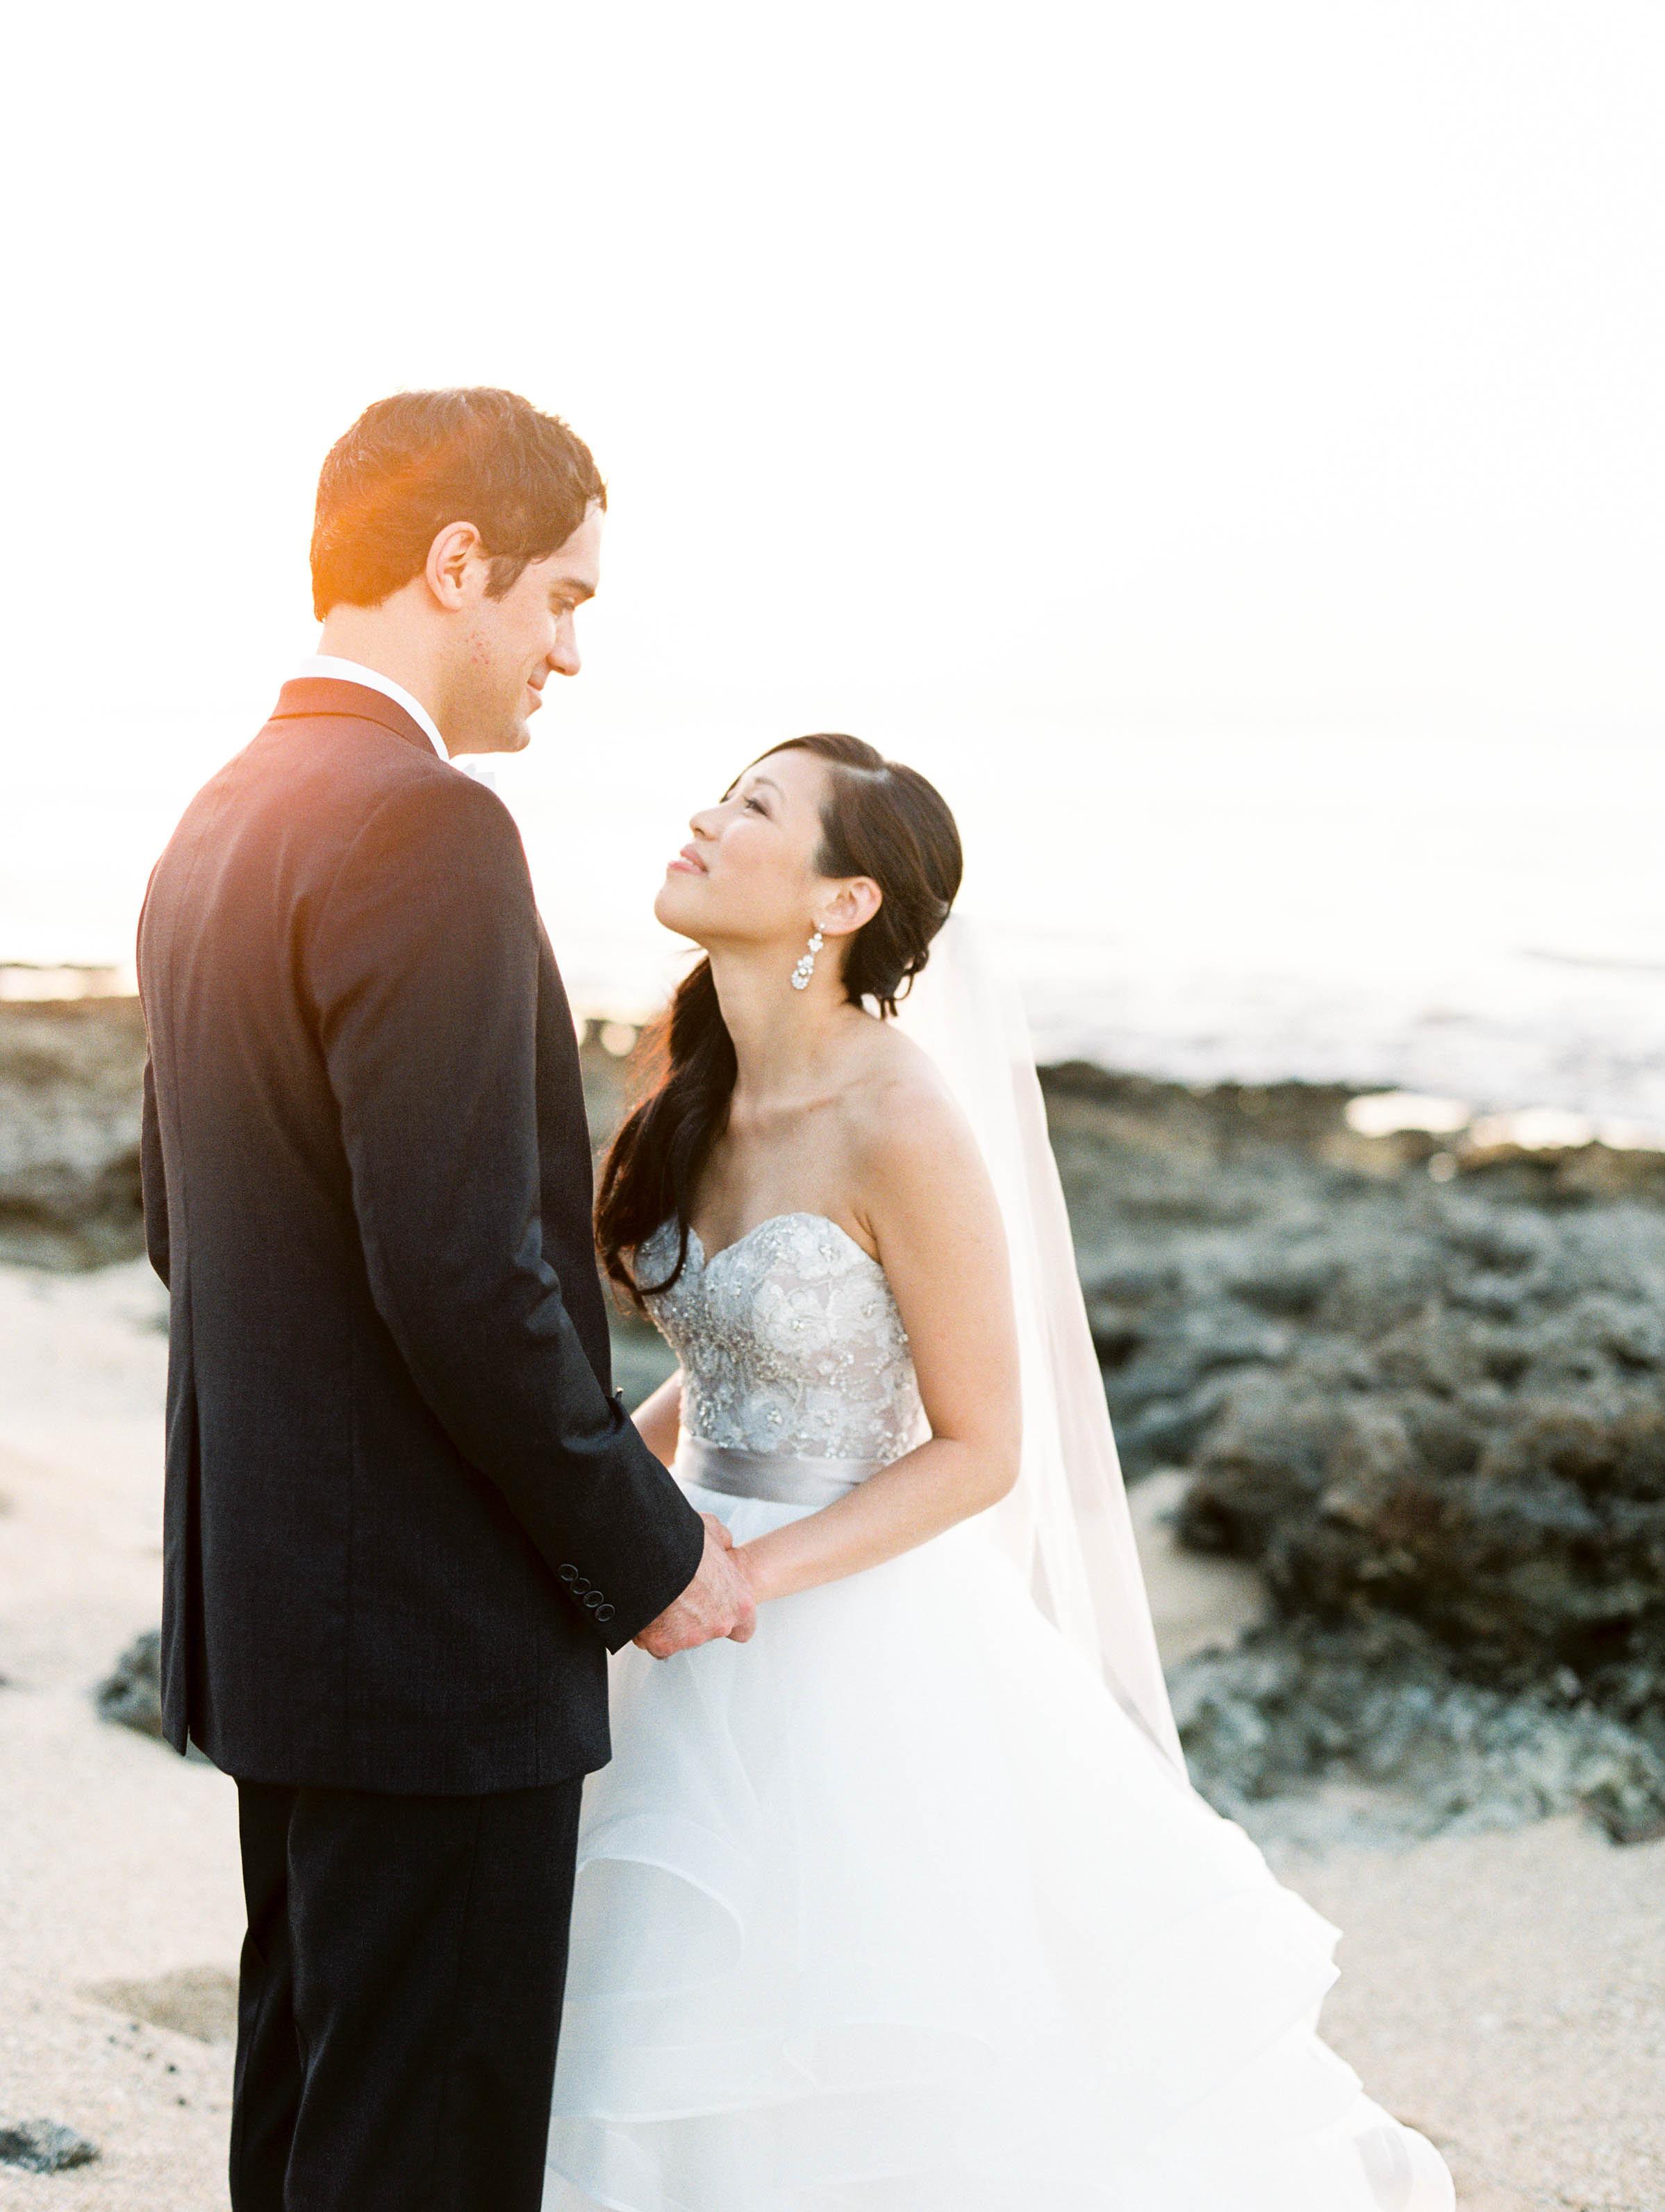 Michelle Garibay Events | Elegant Oahu Wedding | Loulu Palm Estate | Destination Wedding Planner | Beach Sunset Wedding